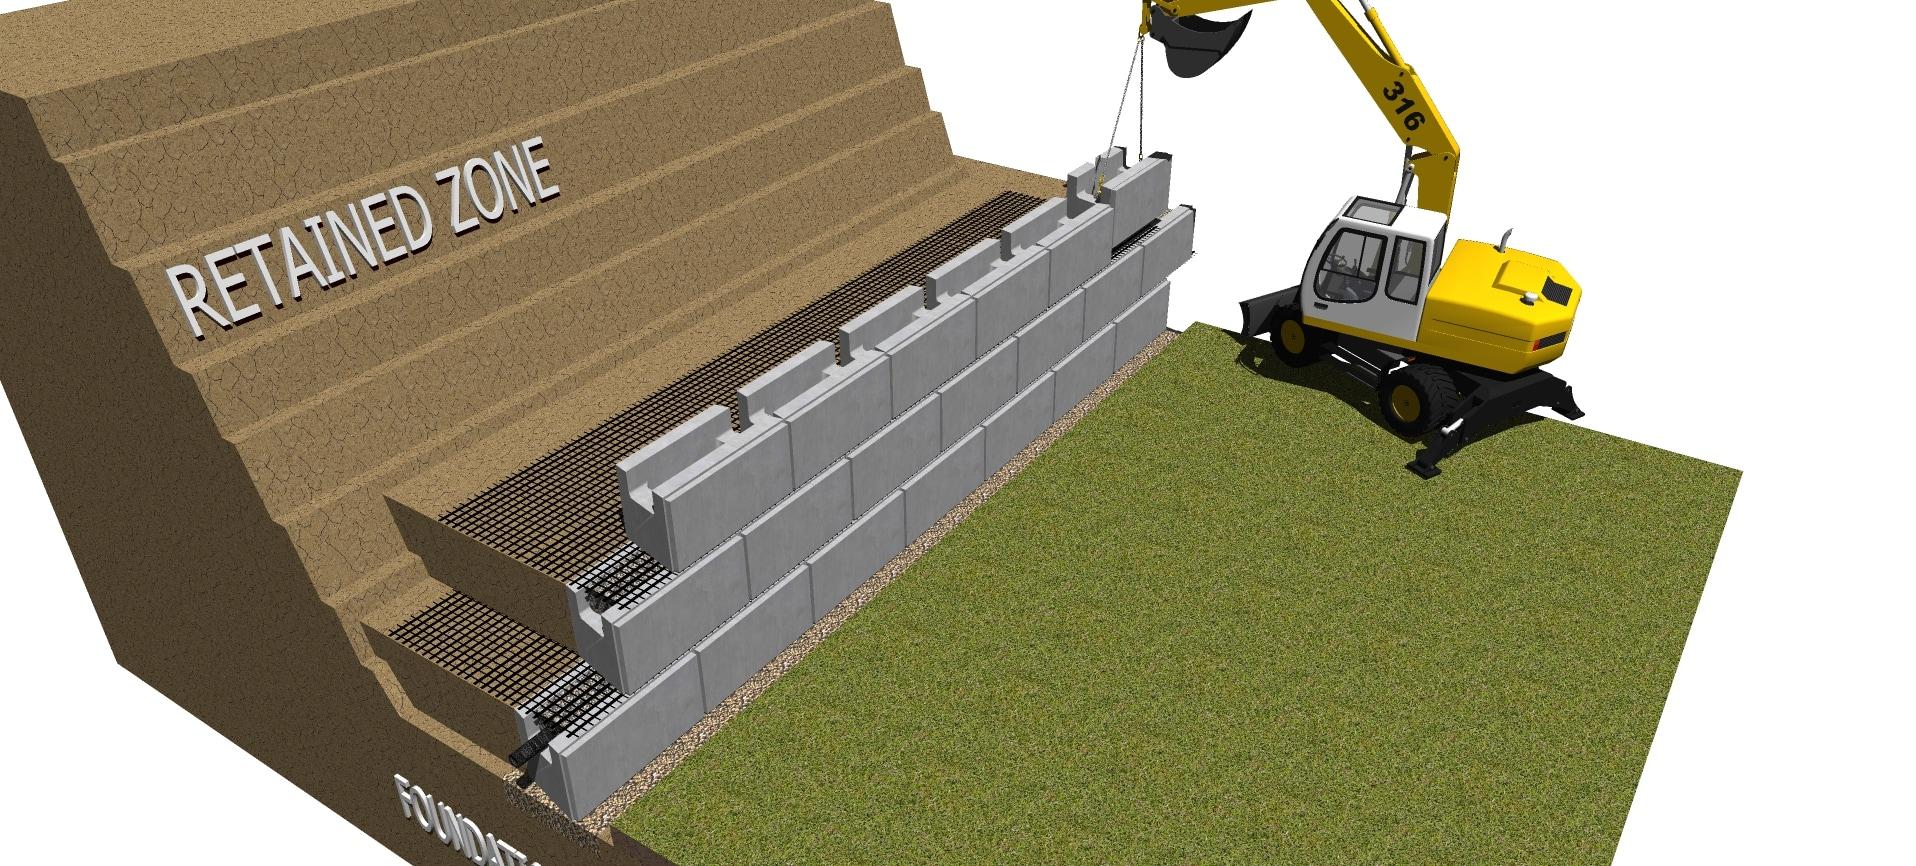 third row installation of magnumstone geogrid retaining wall block